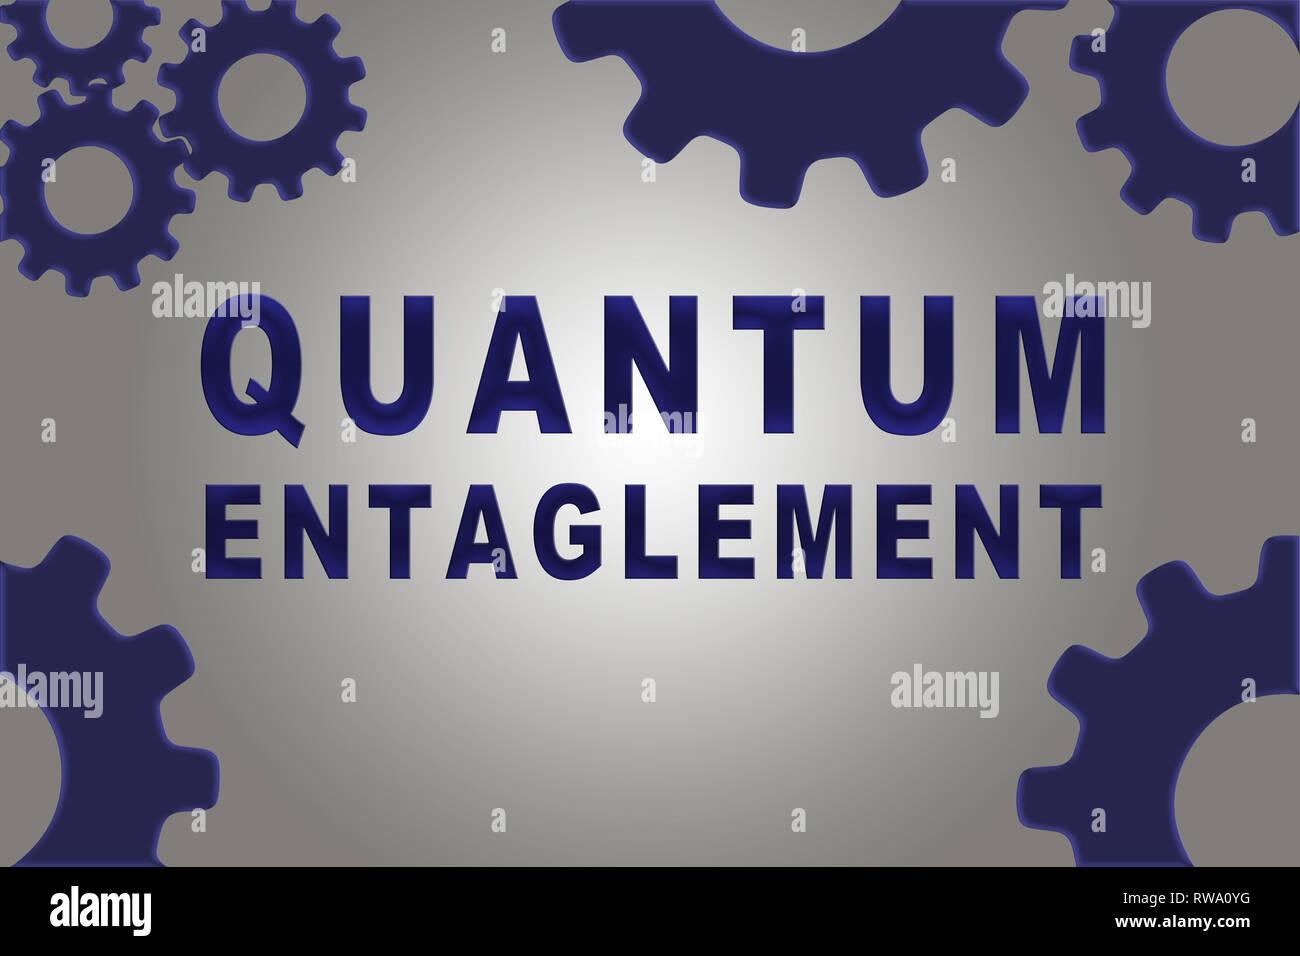 QUANTUM ENTAGLEMENT sign concept illustration with blue gear wheel figures on gray gradient - Stock Image